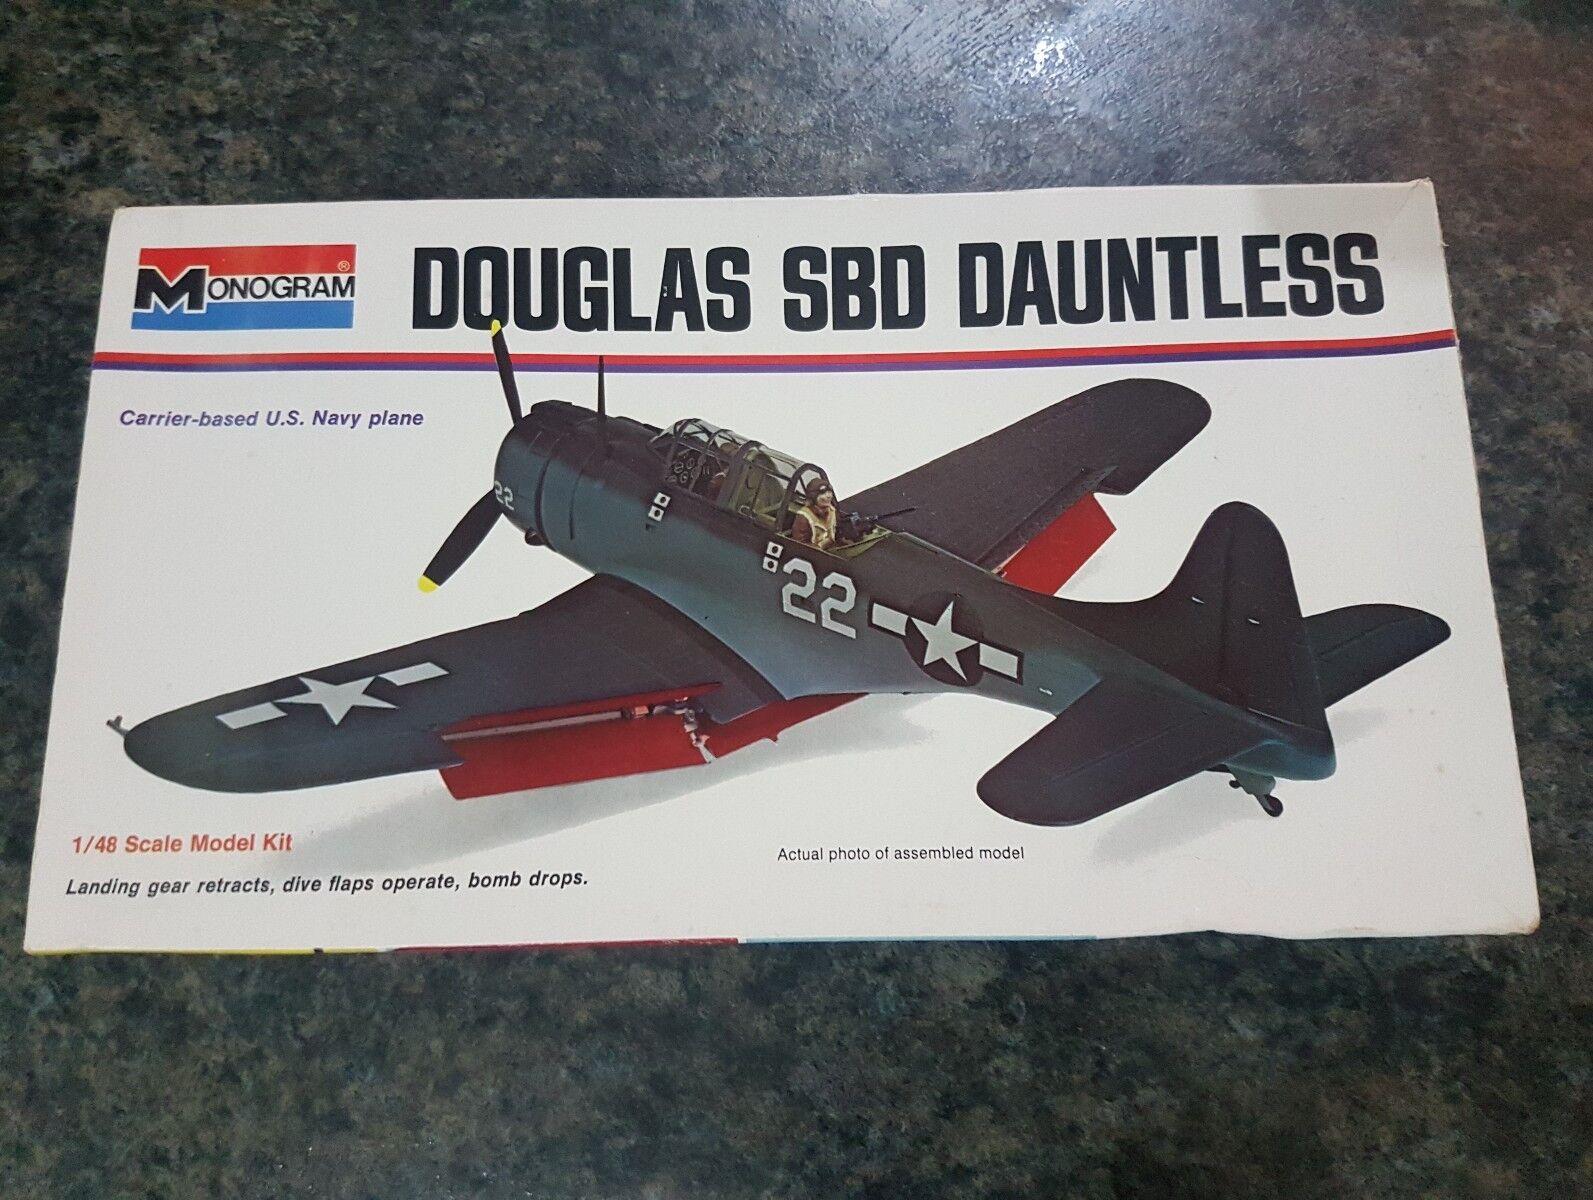 Monogram 1 48 US Douglas SBD Dauntless WW2 Aircraft Great Condition Very Rare